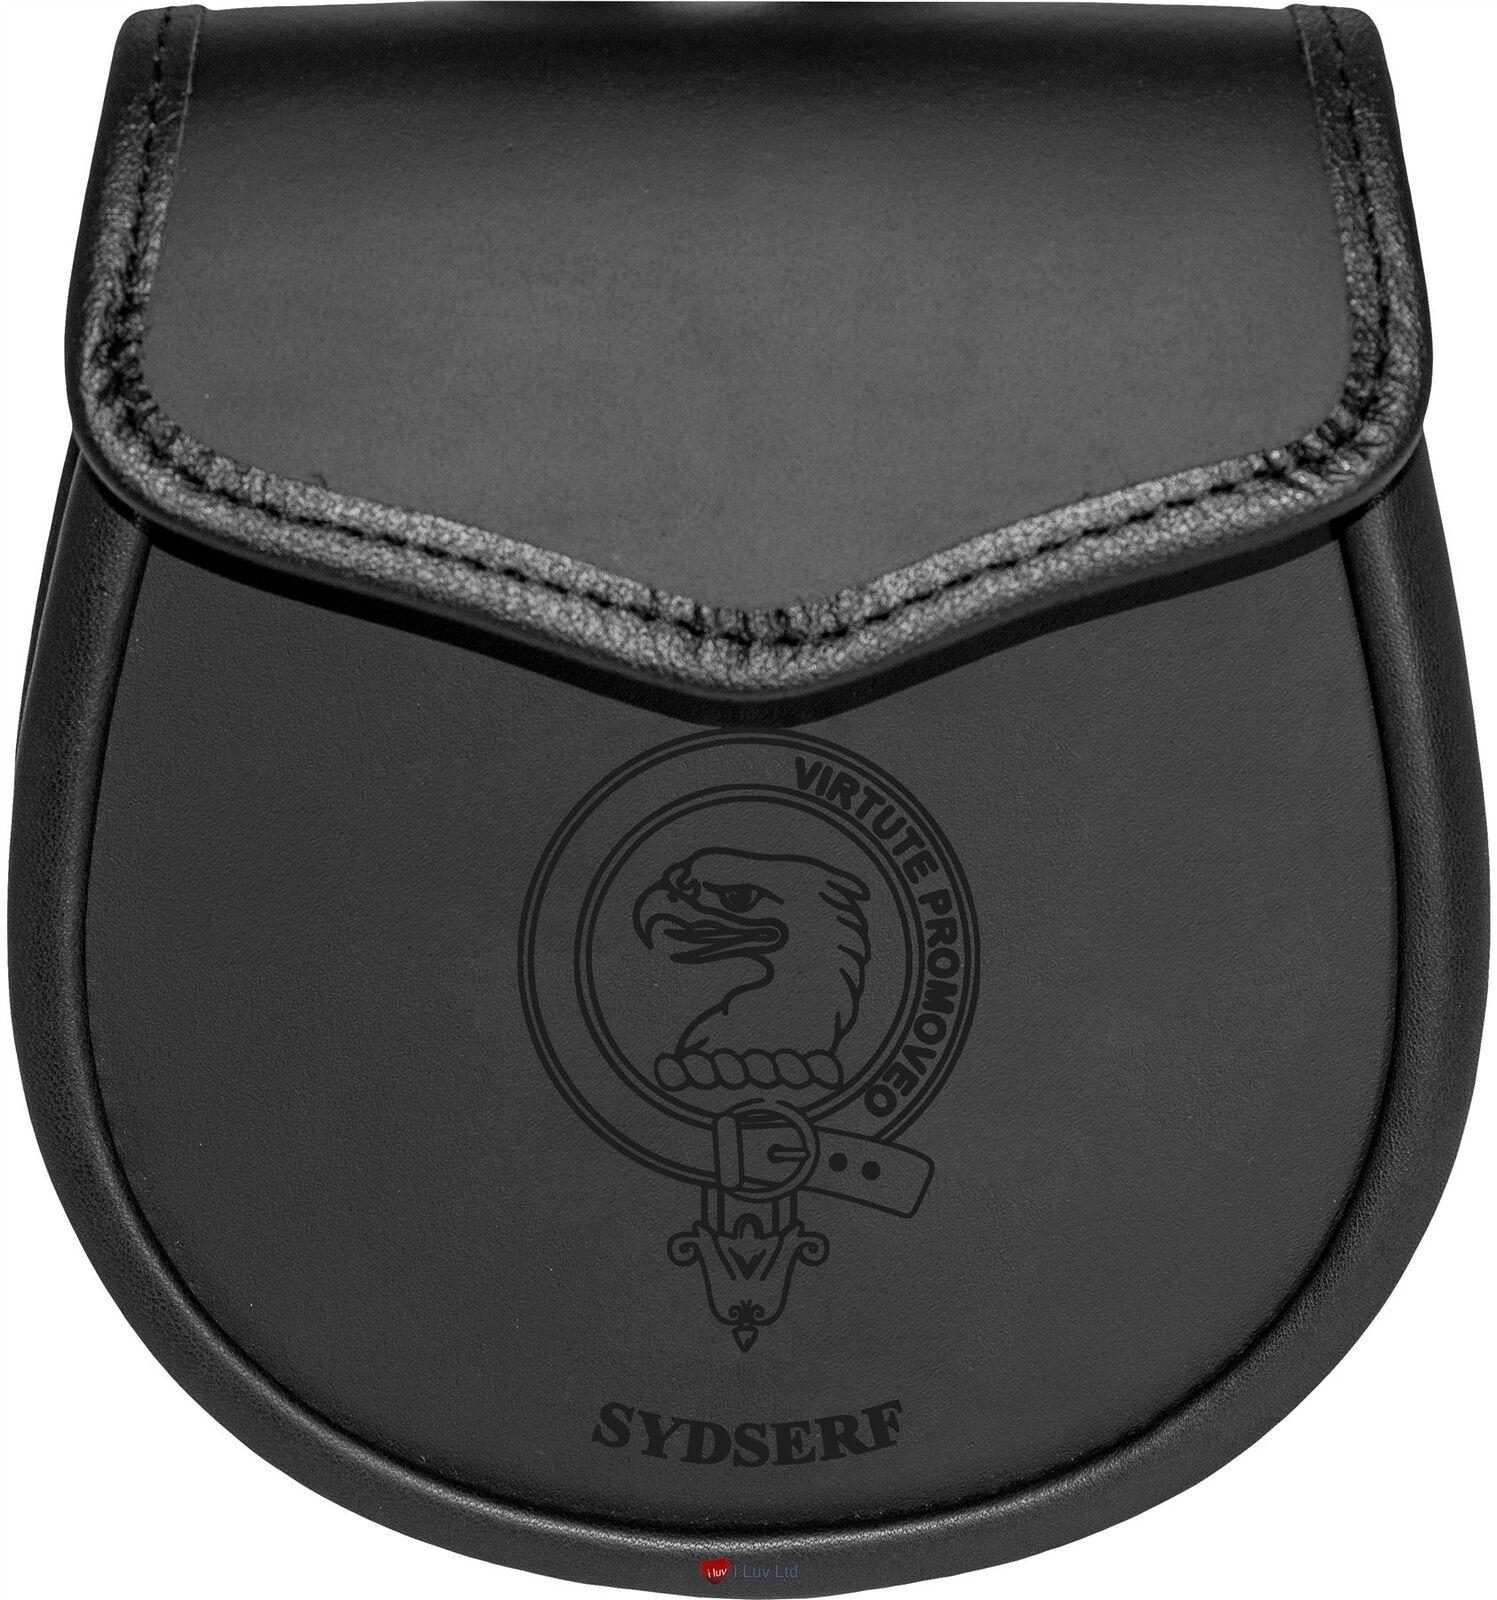 Sydserf Leather Day Sporran Scottish Clan Crest